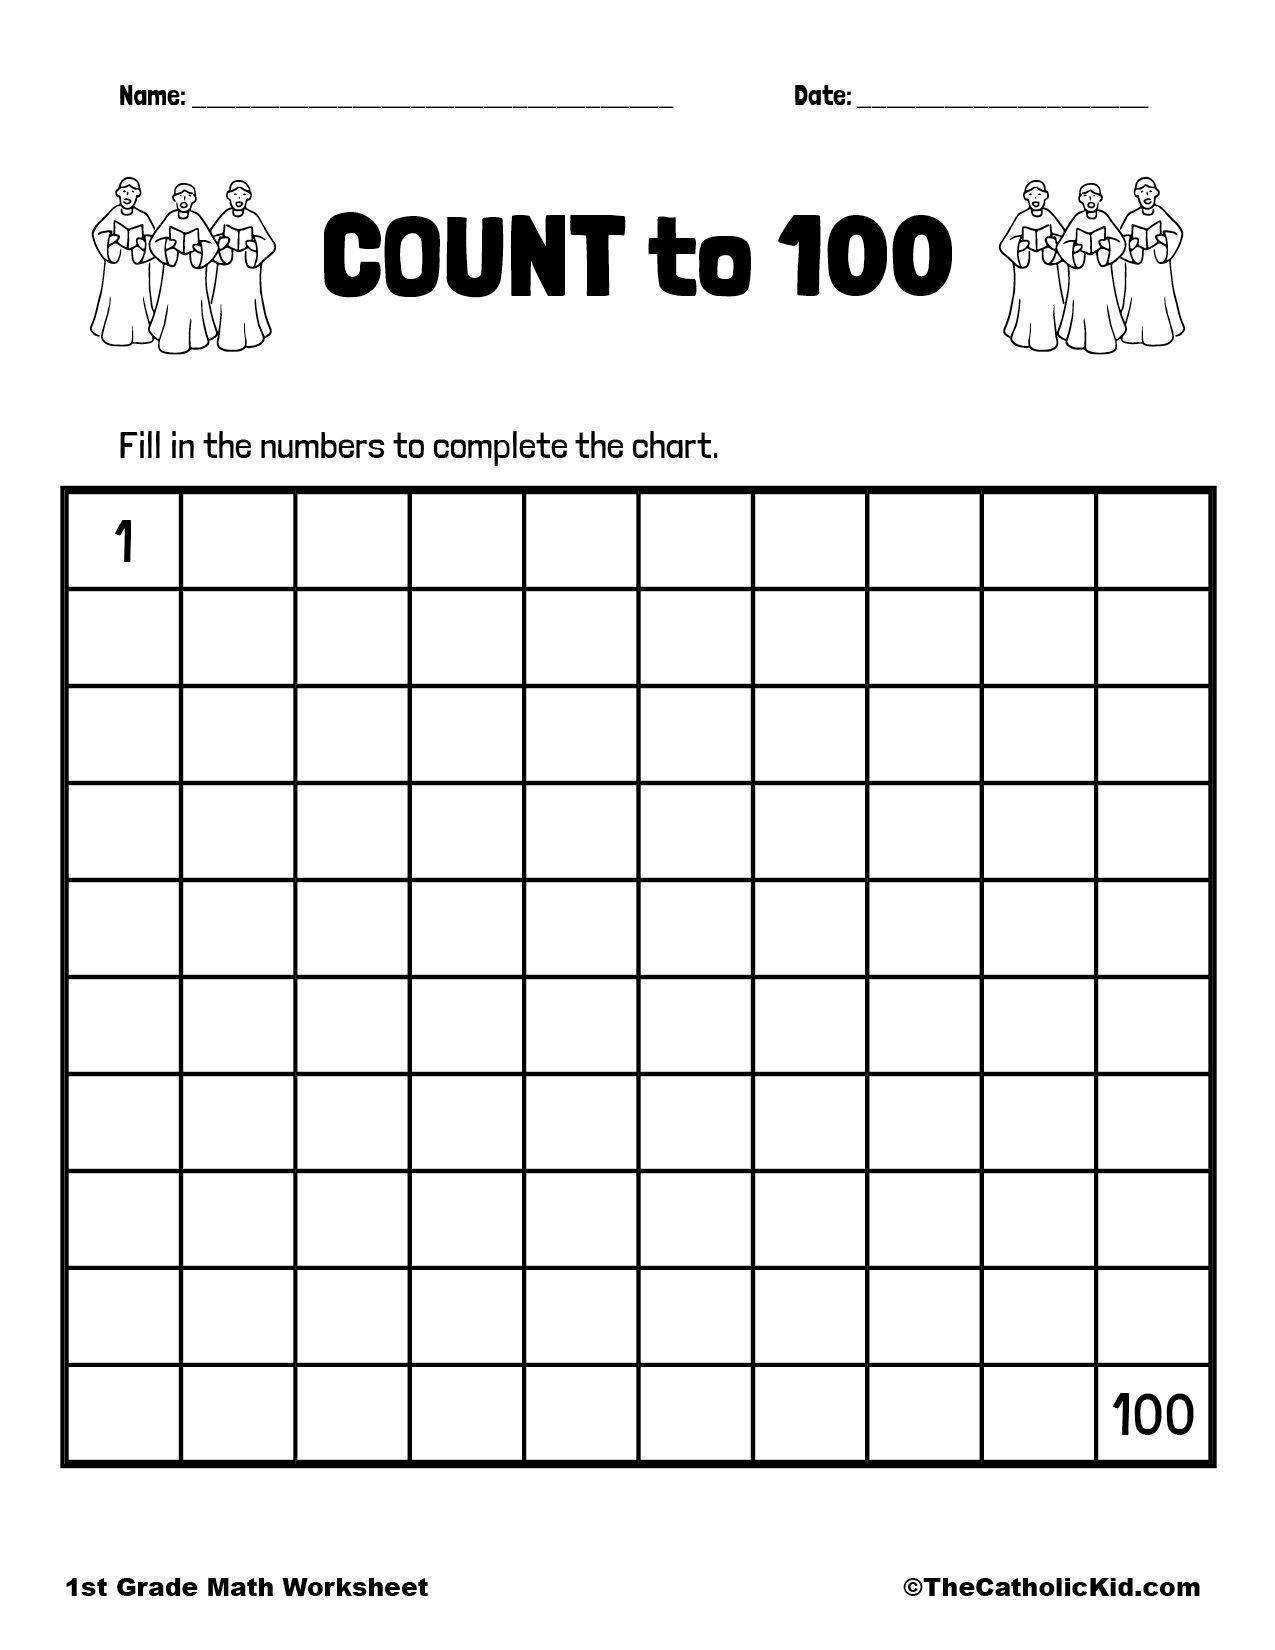 Count to 100 - 1st Grade Math Worksheet Catholic